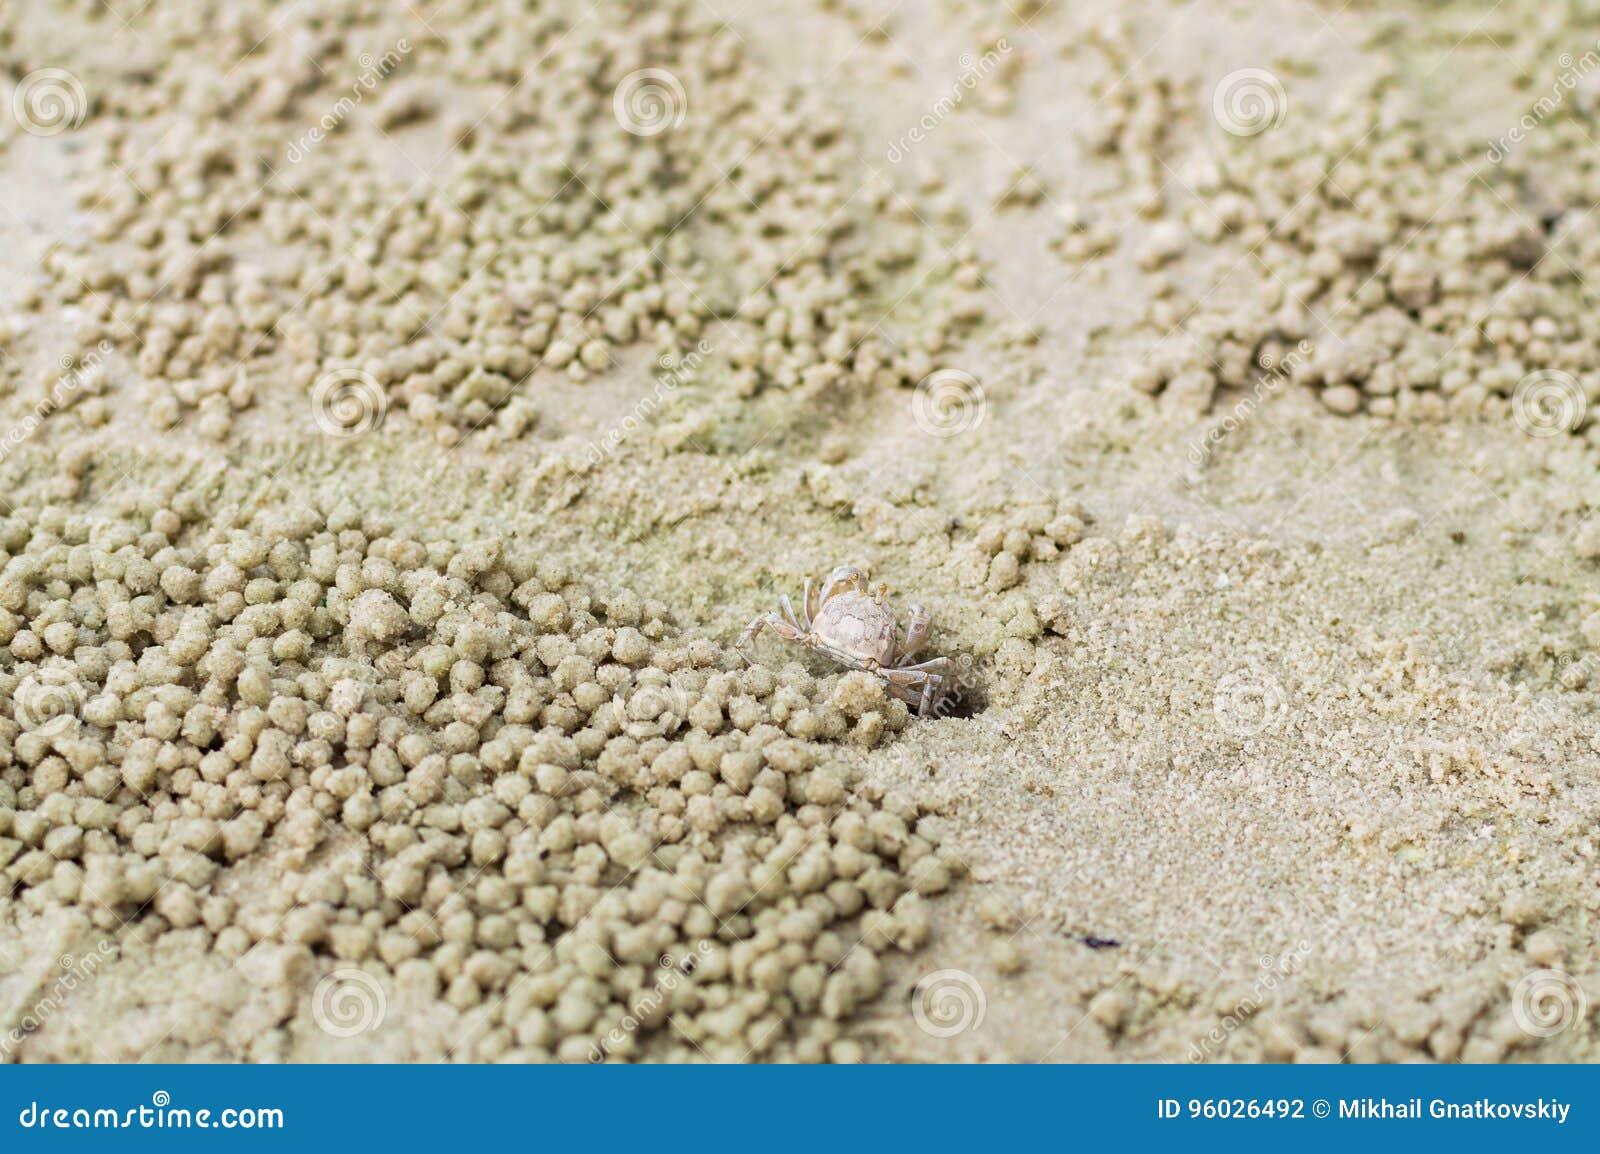 Mały ducha krab robi piasek piłce